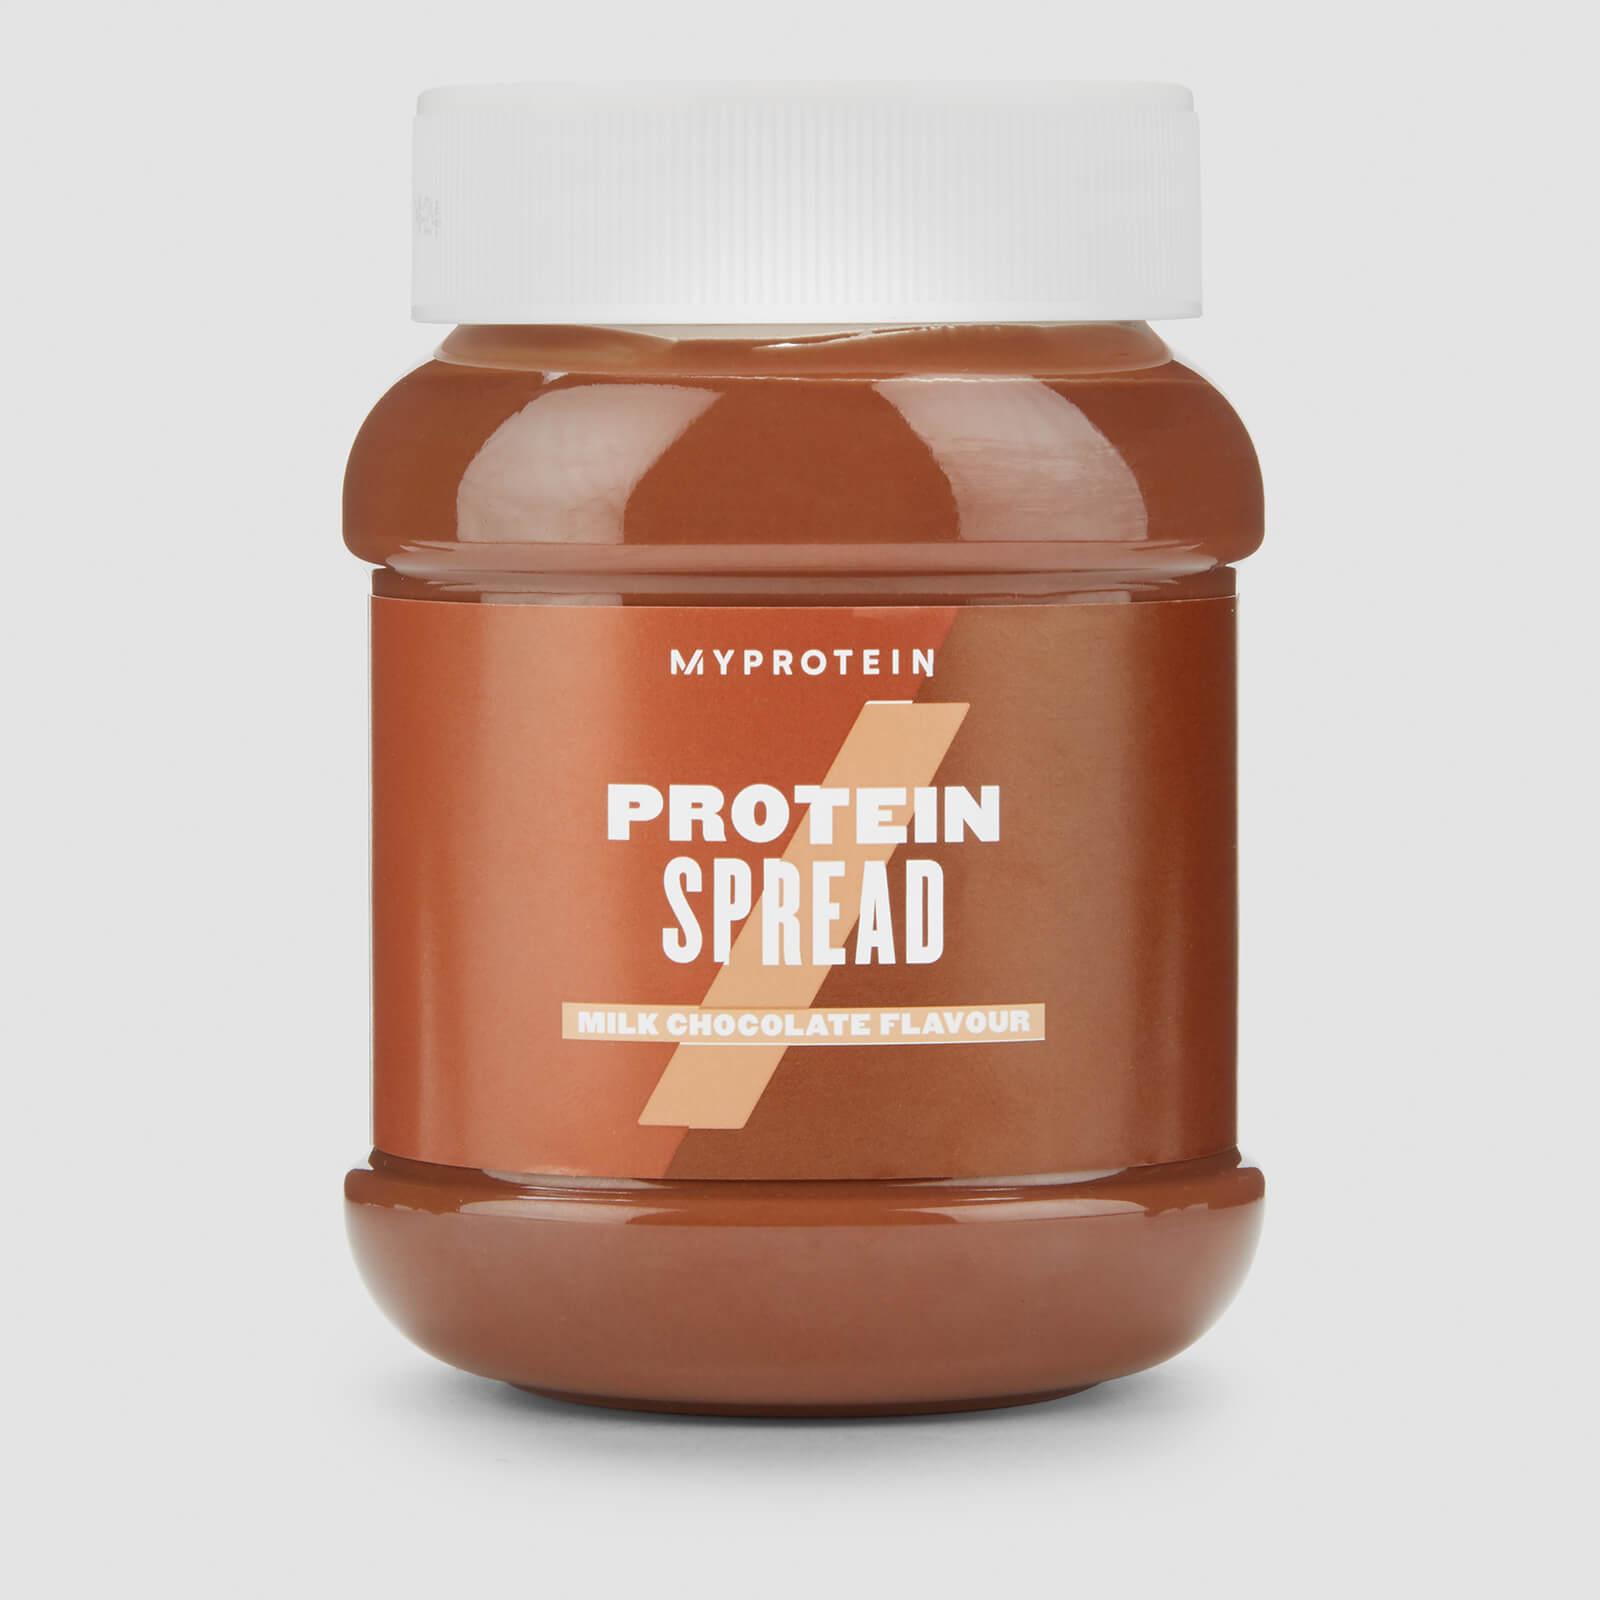 Myprotein Pâte à tartiner protéinée - 360g - Chocolat au lait